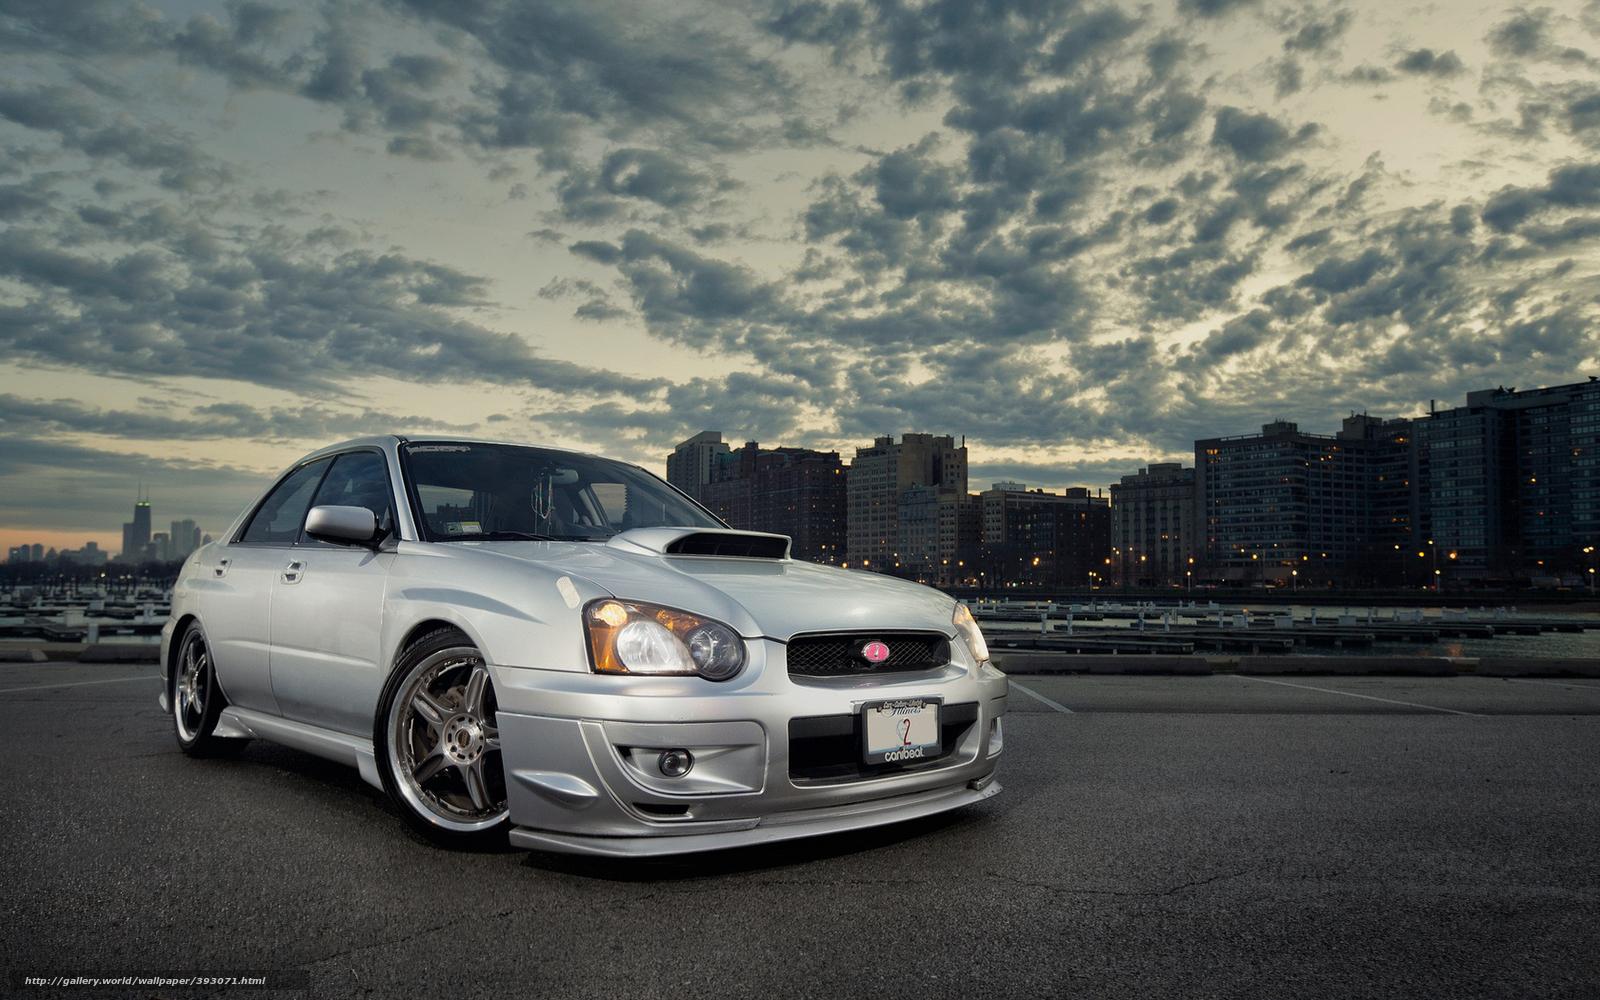 Download Wallpaper Subaru Impreza Silver City Free Desktop Wallpaper In The Resolution